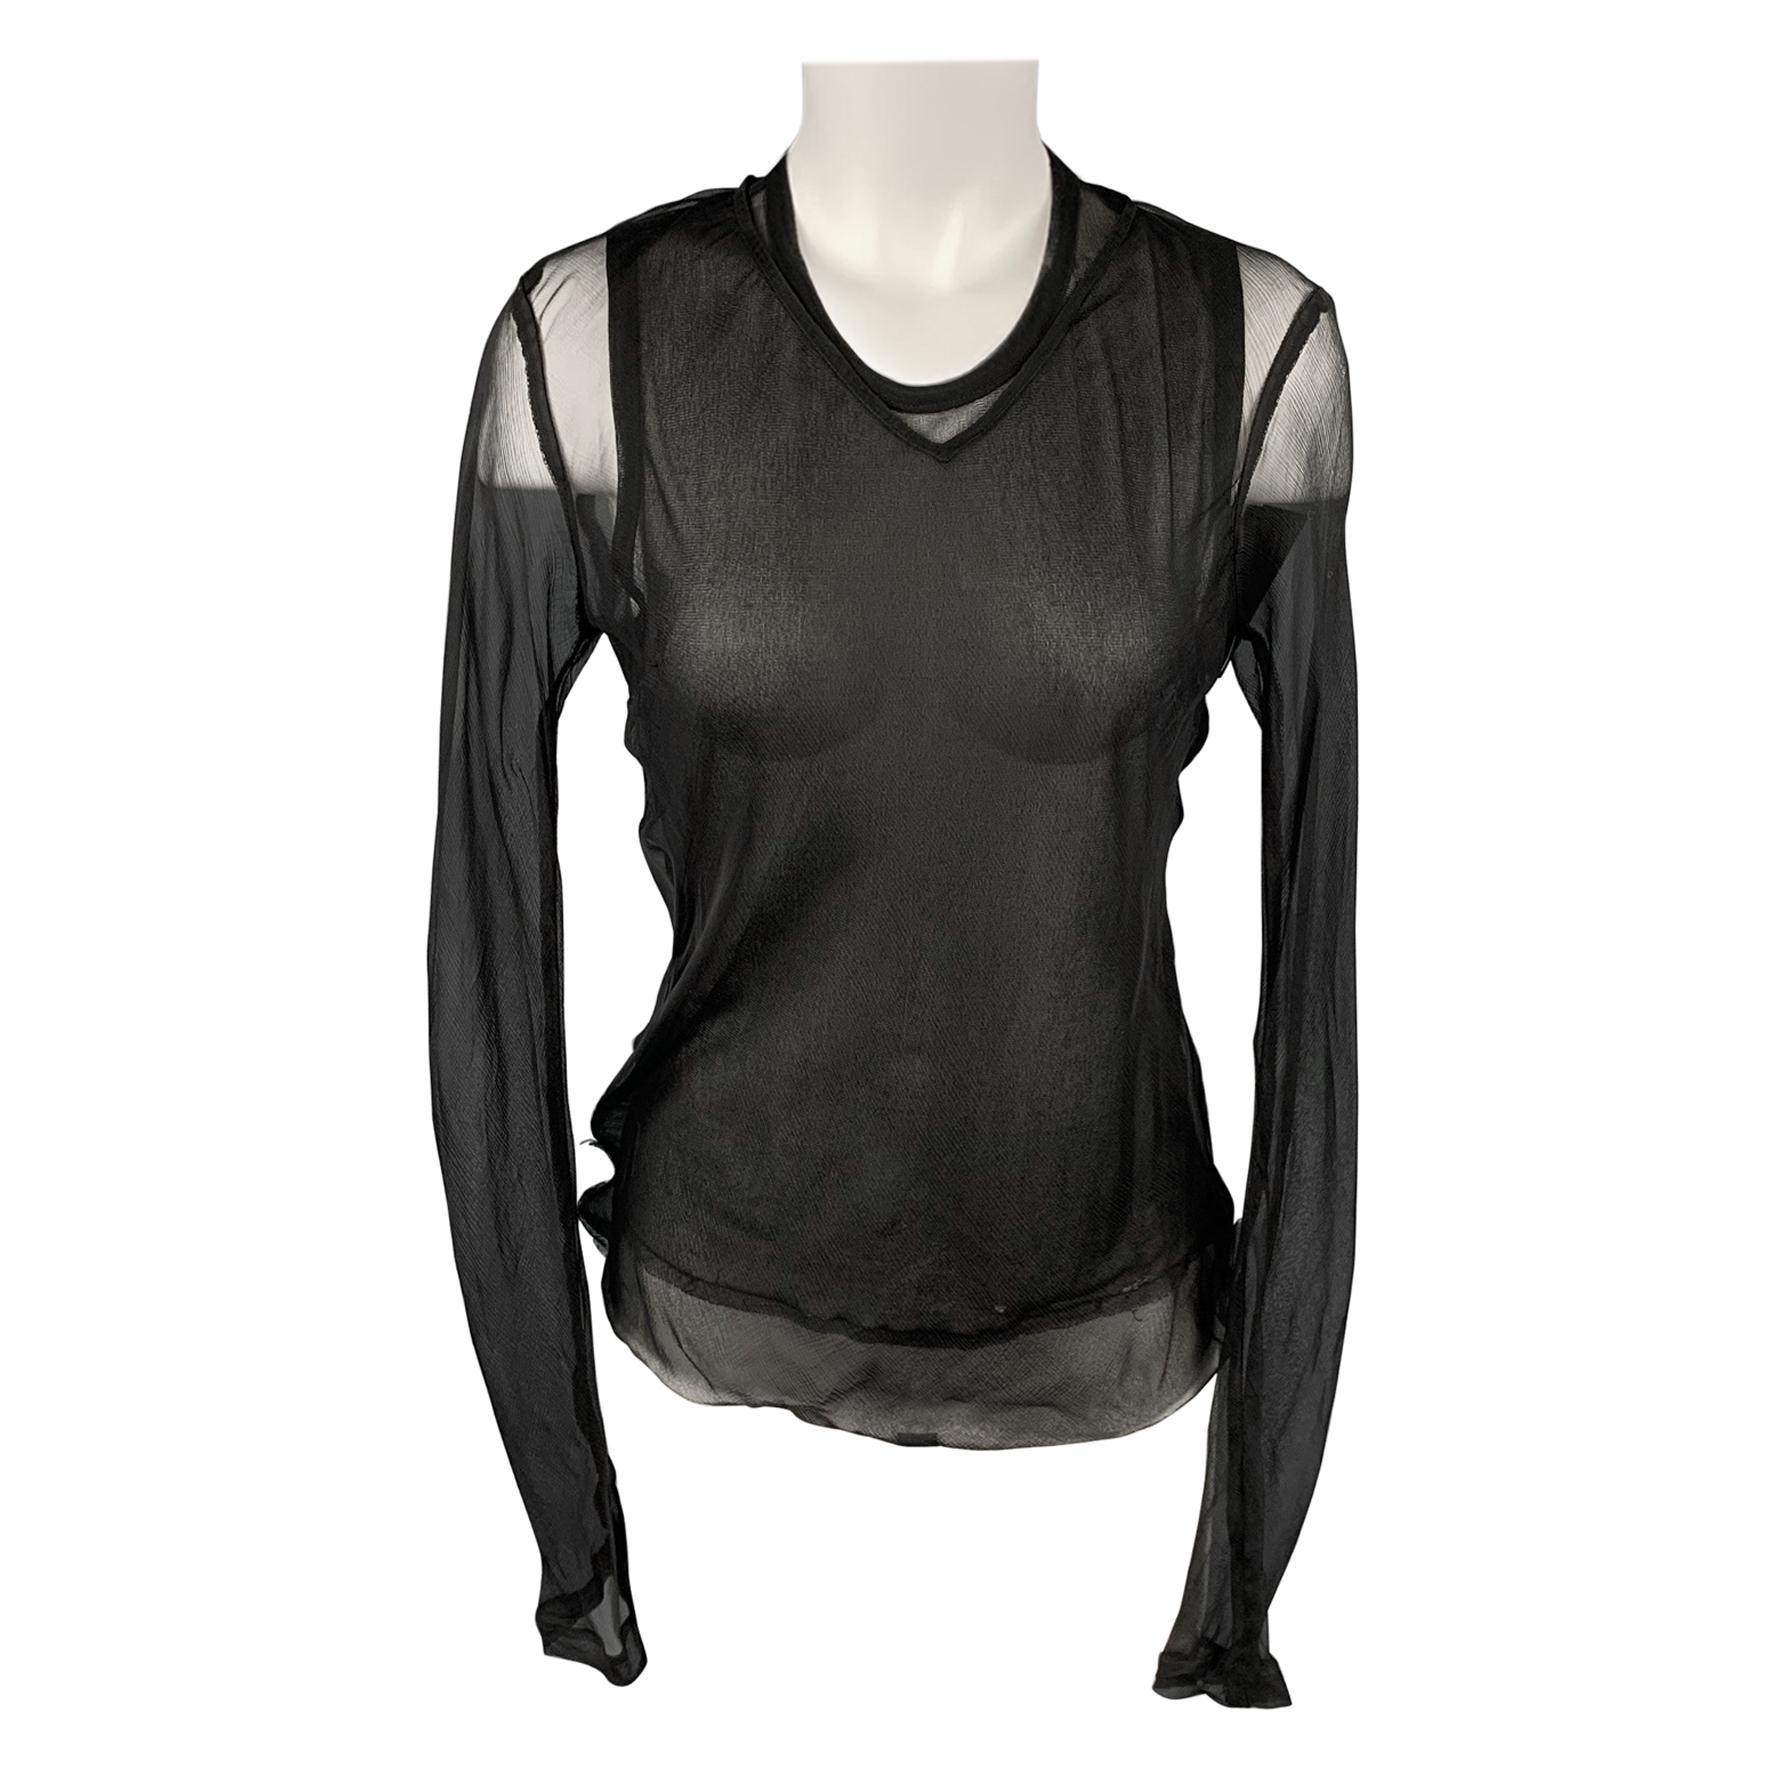 DRIES VAN NOTEN Size 10 Black See Through Layered Blouse